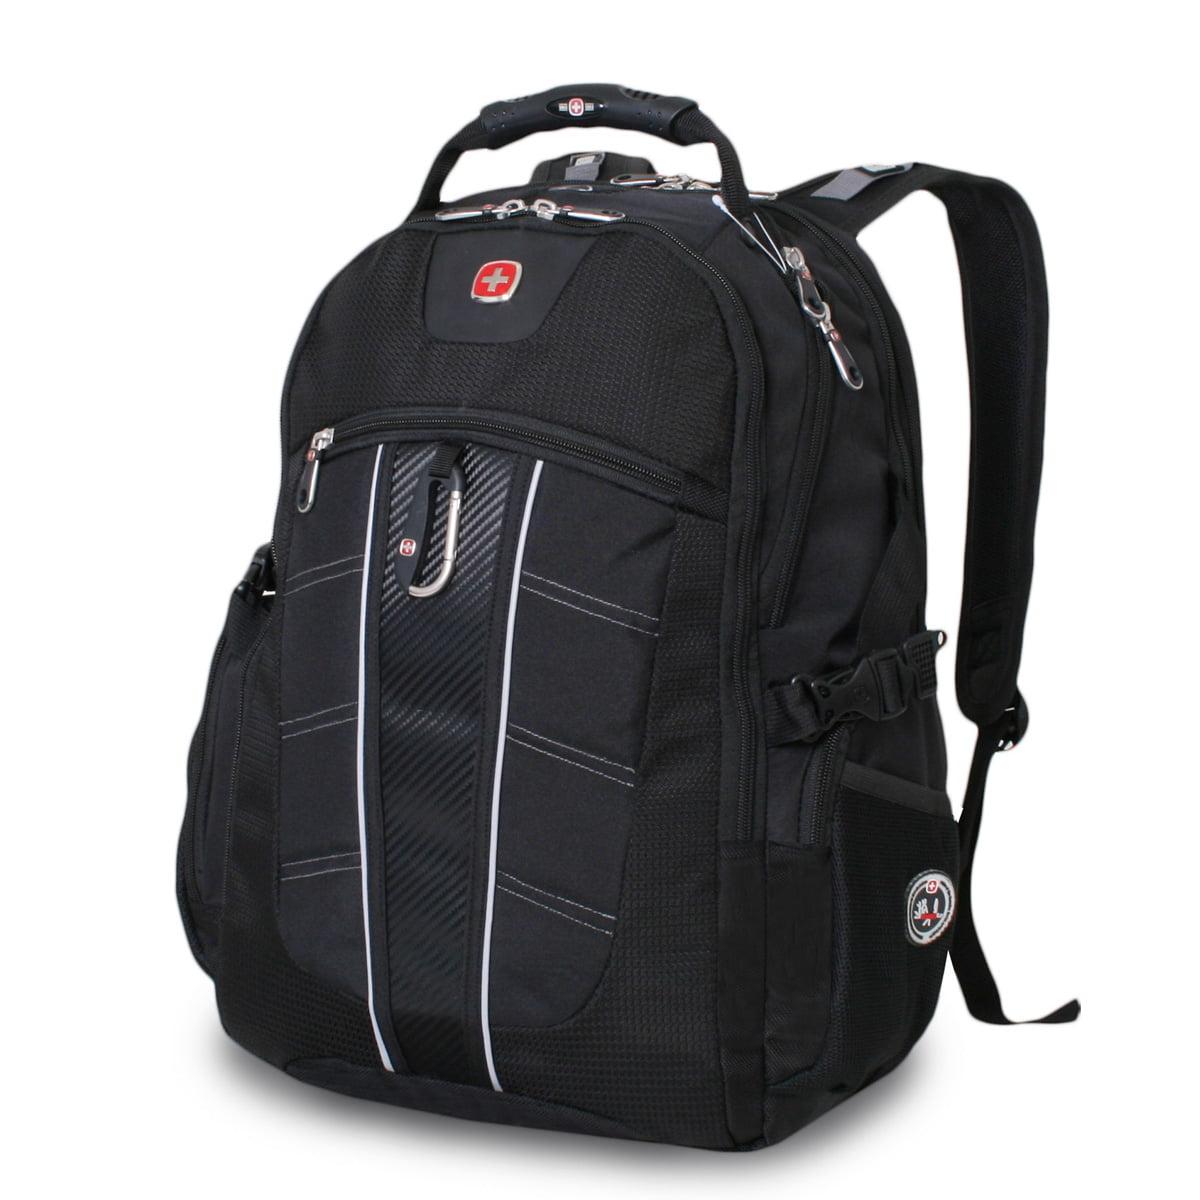 "SWISSGEAR ScanSmart 18.5"" Backpack - Black"